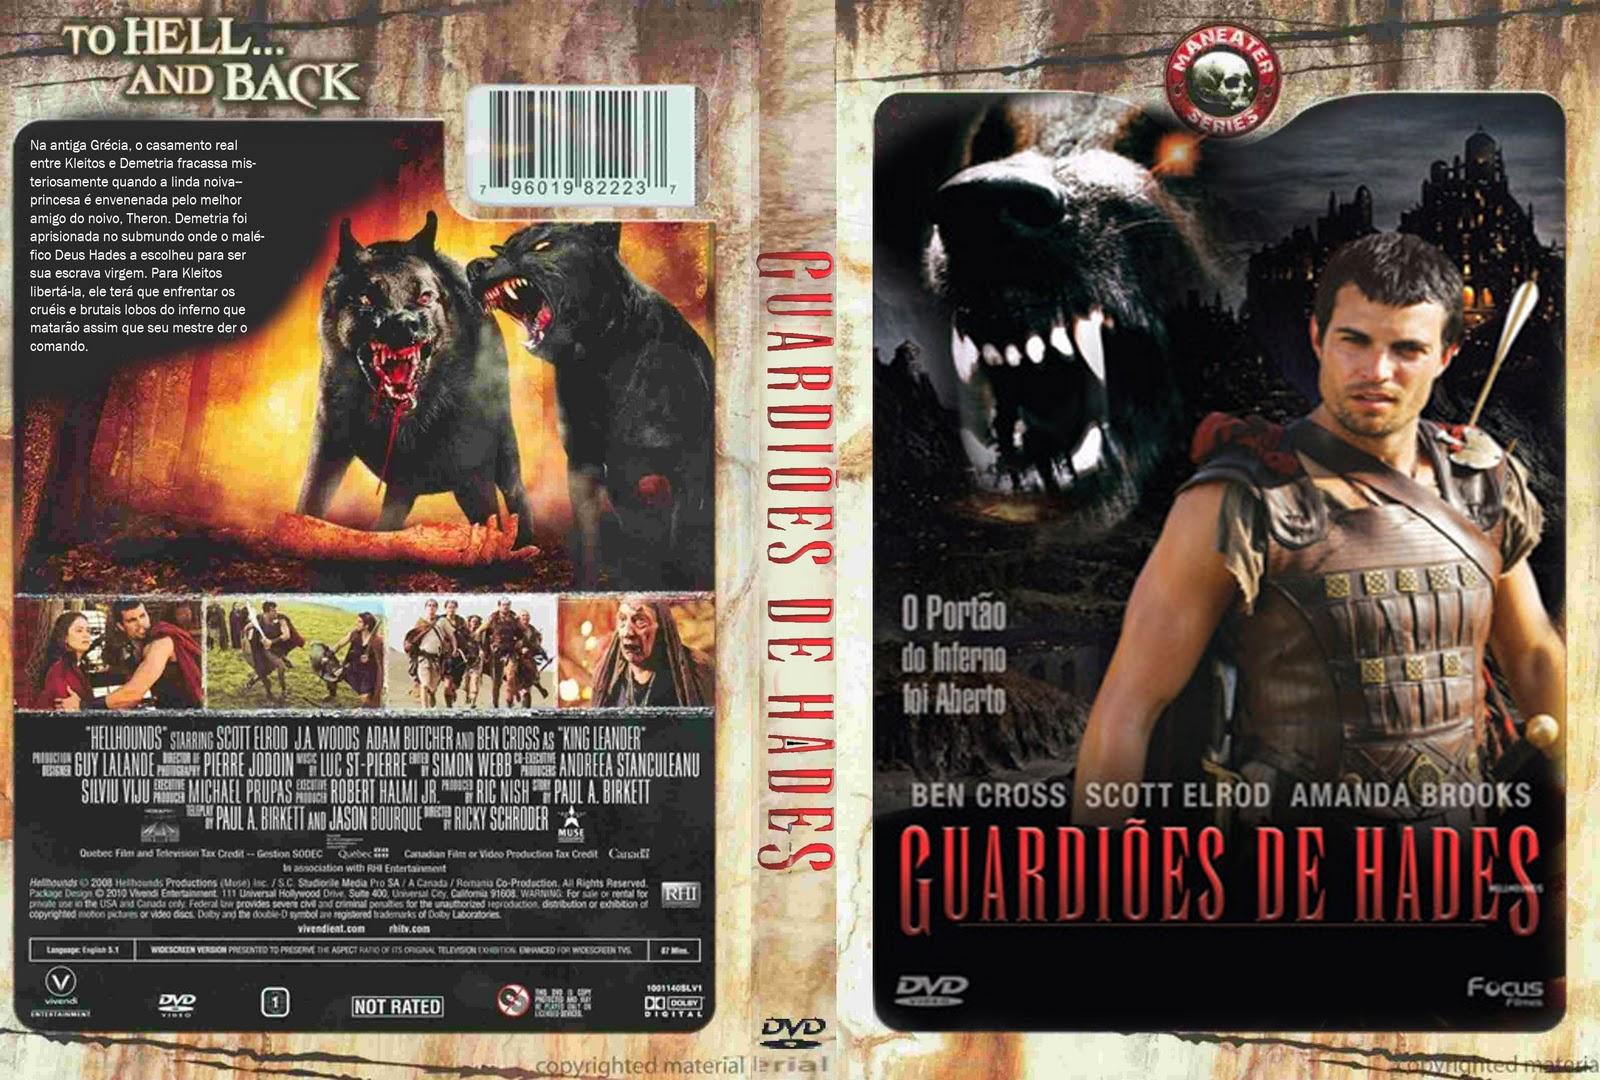 Filme Hades for dc capas: guardiões de hades